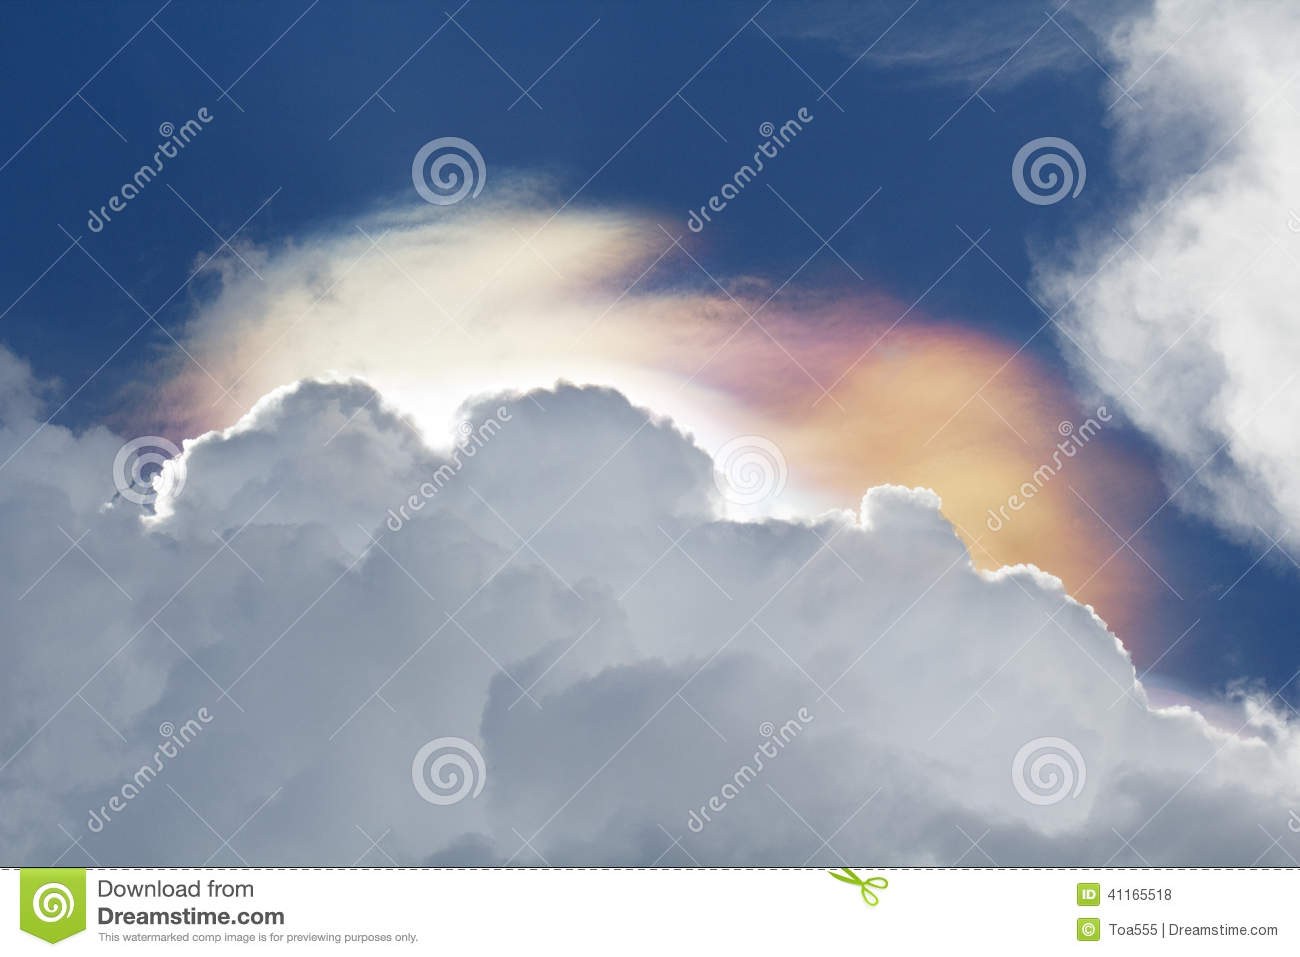 Iridescent Clouds Phenomenon Stock Photo.